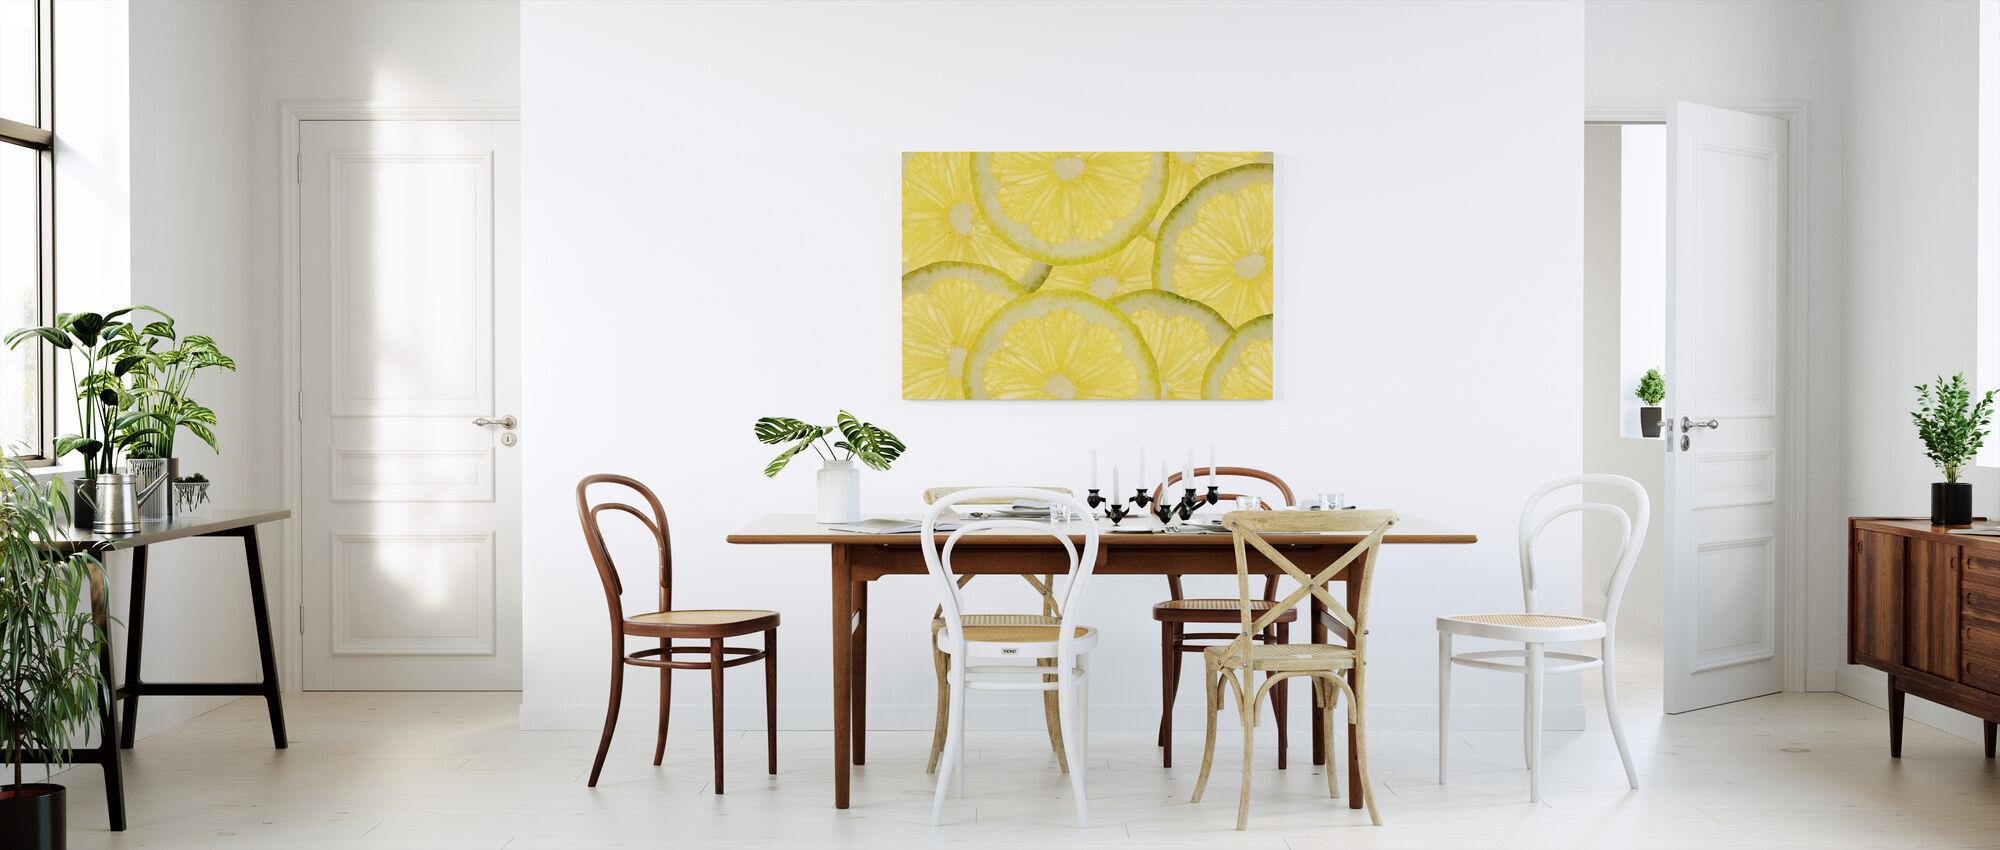 Sliced Lemons - Canvas print - Kitchen